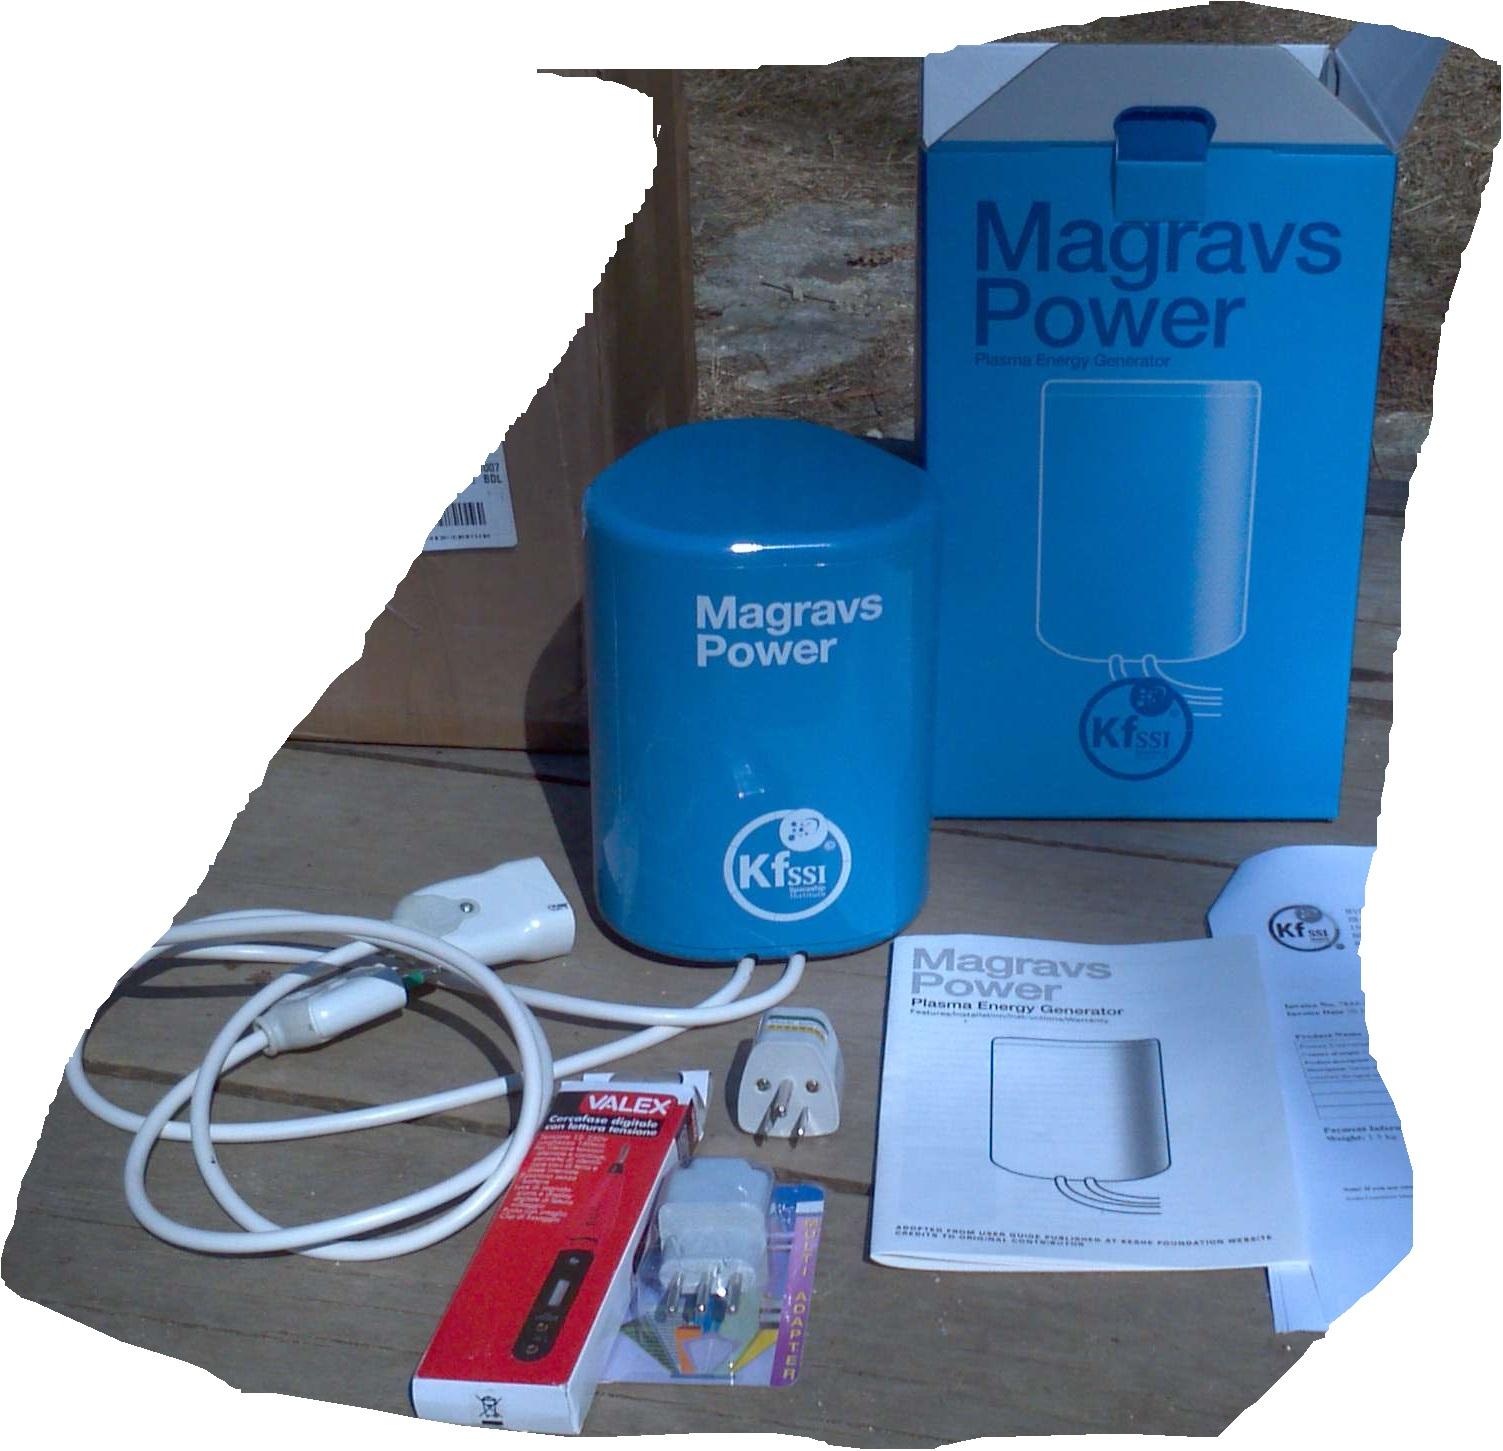 Generator magrav How To